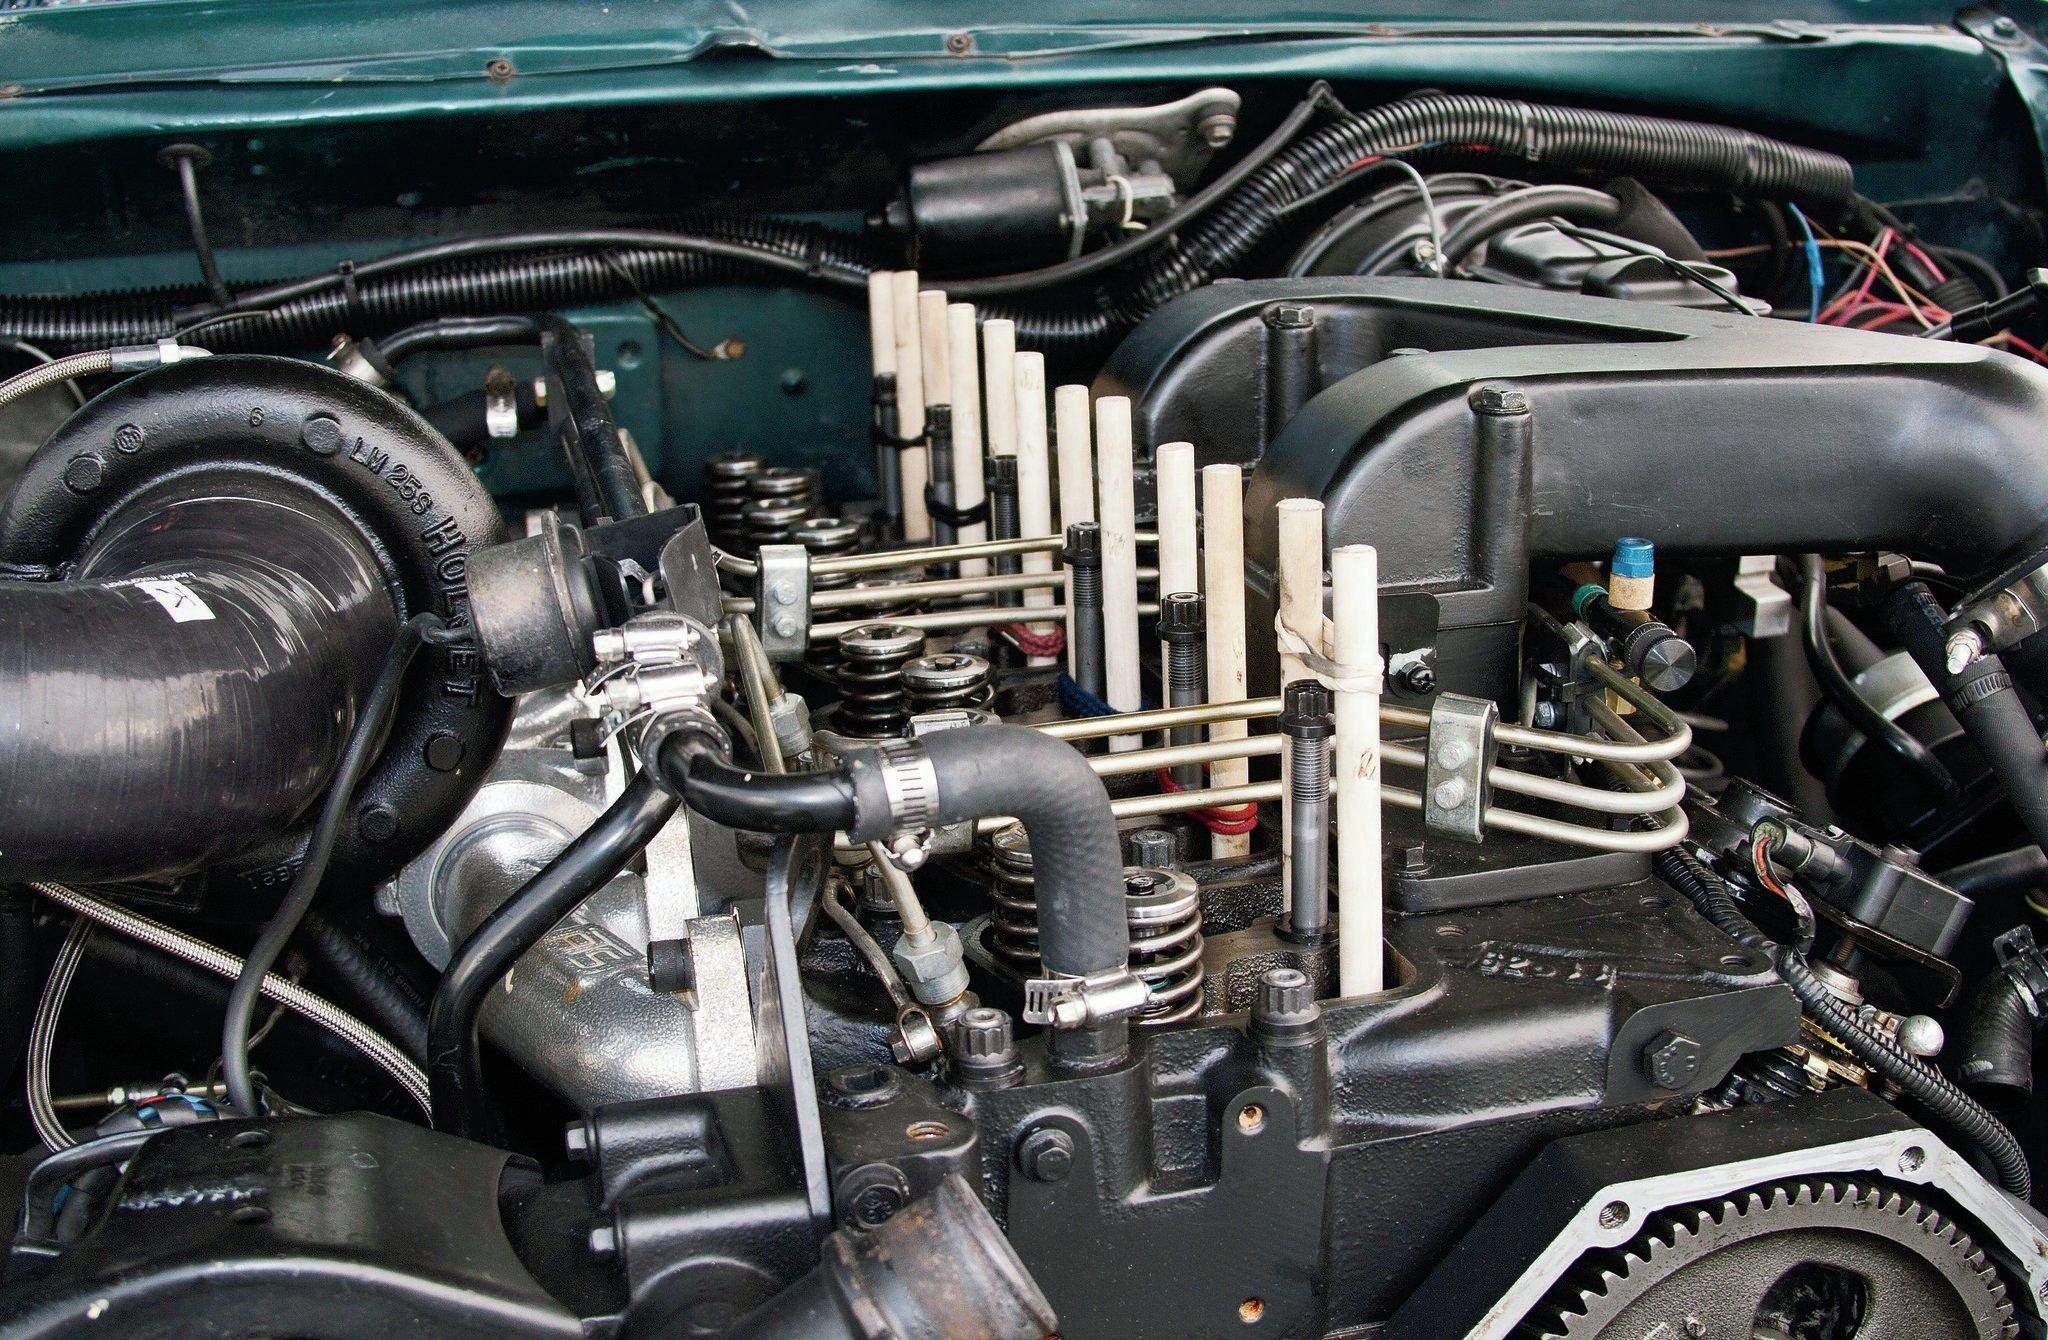 P7100 Pump Diagram Schematics Wiring Diagrams 1998 Mack Fuel 1993 Dodge Ram W250 Pickup 4x4 Custom Wallpaper 2048x1340 865052 Wallpaperup Bosch Injection